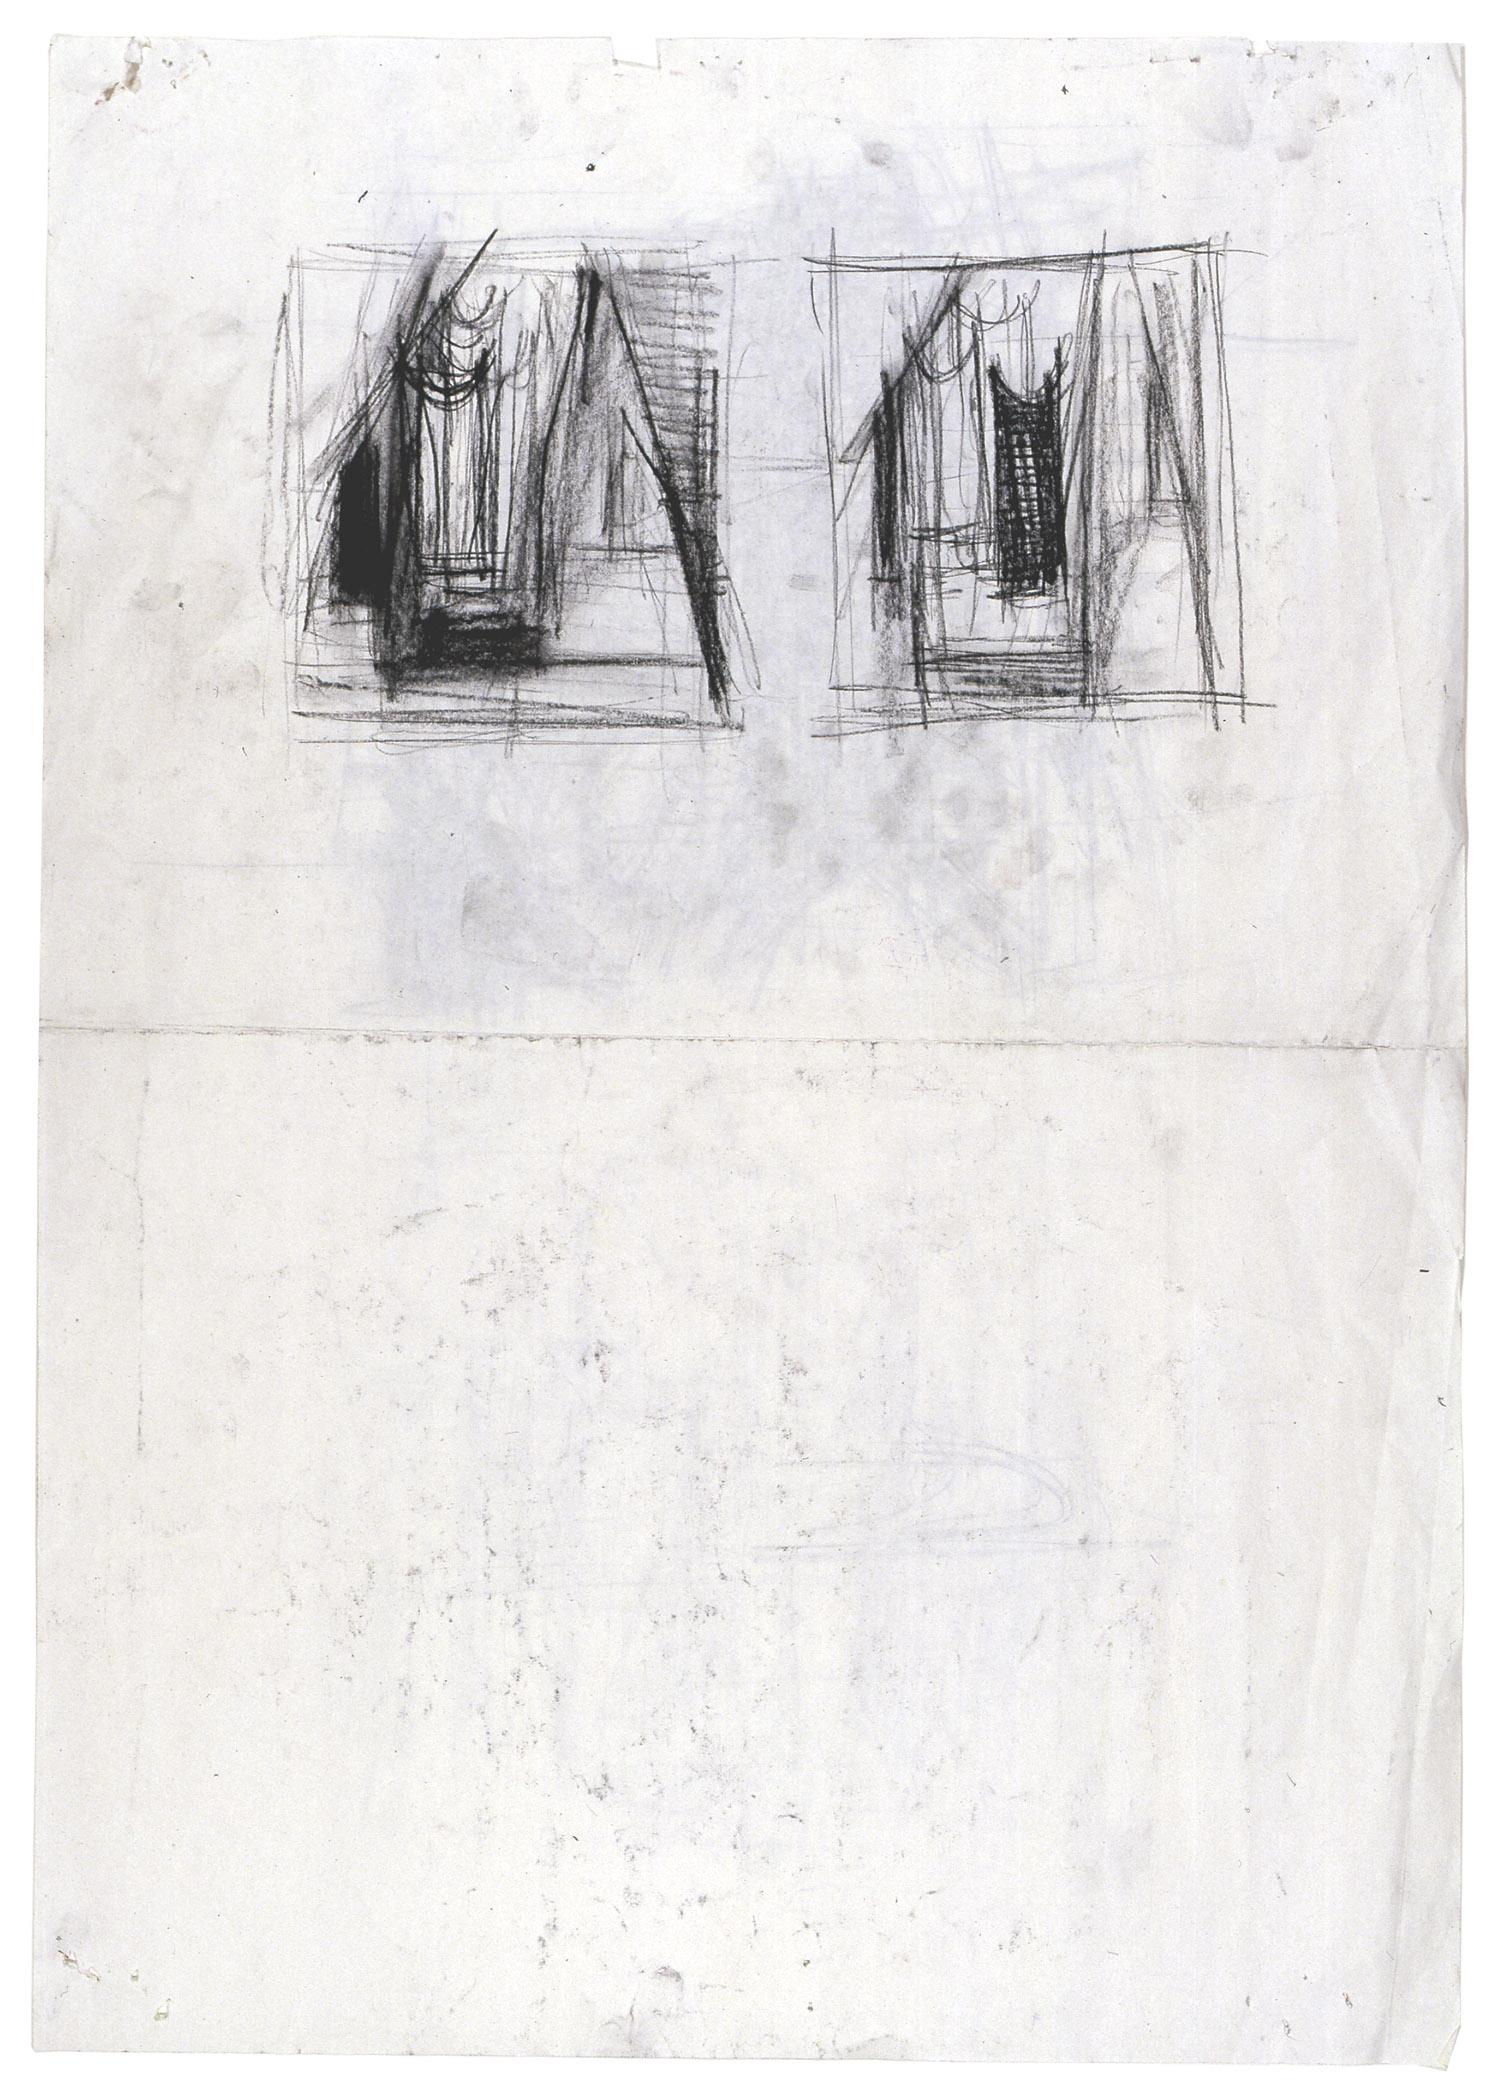 o.T. | 1992 | Kohle auf Papier, doppelseitig | 57,5 x 41 cm